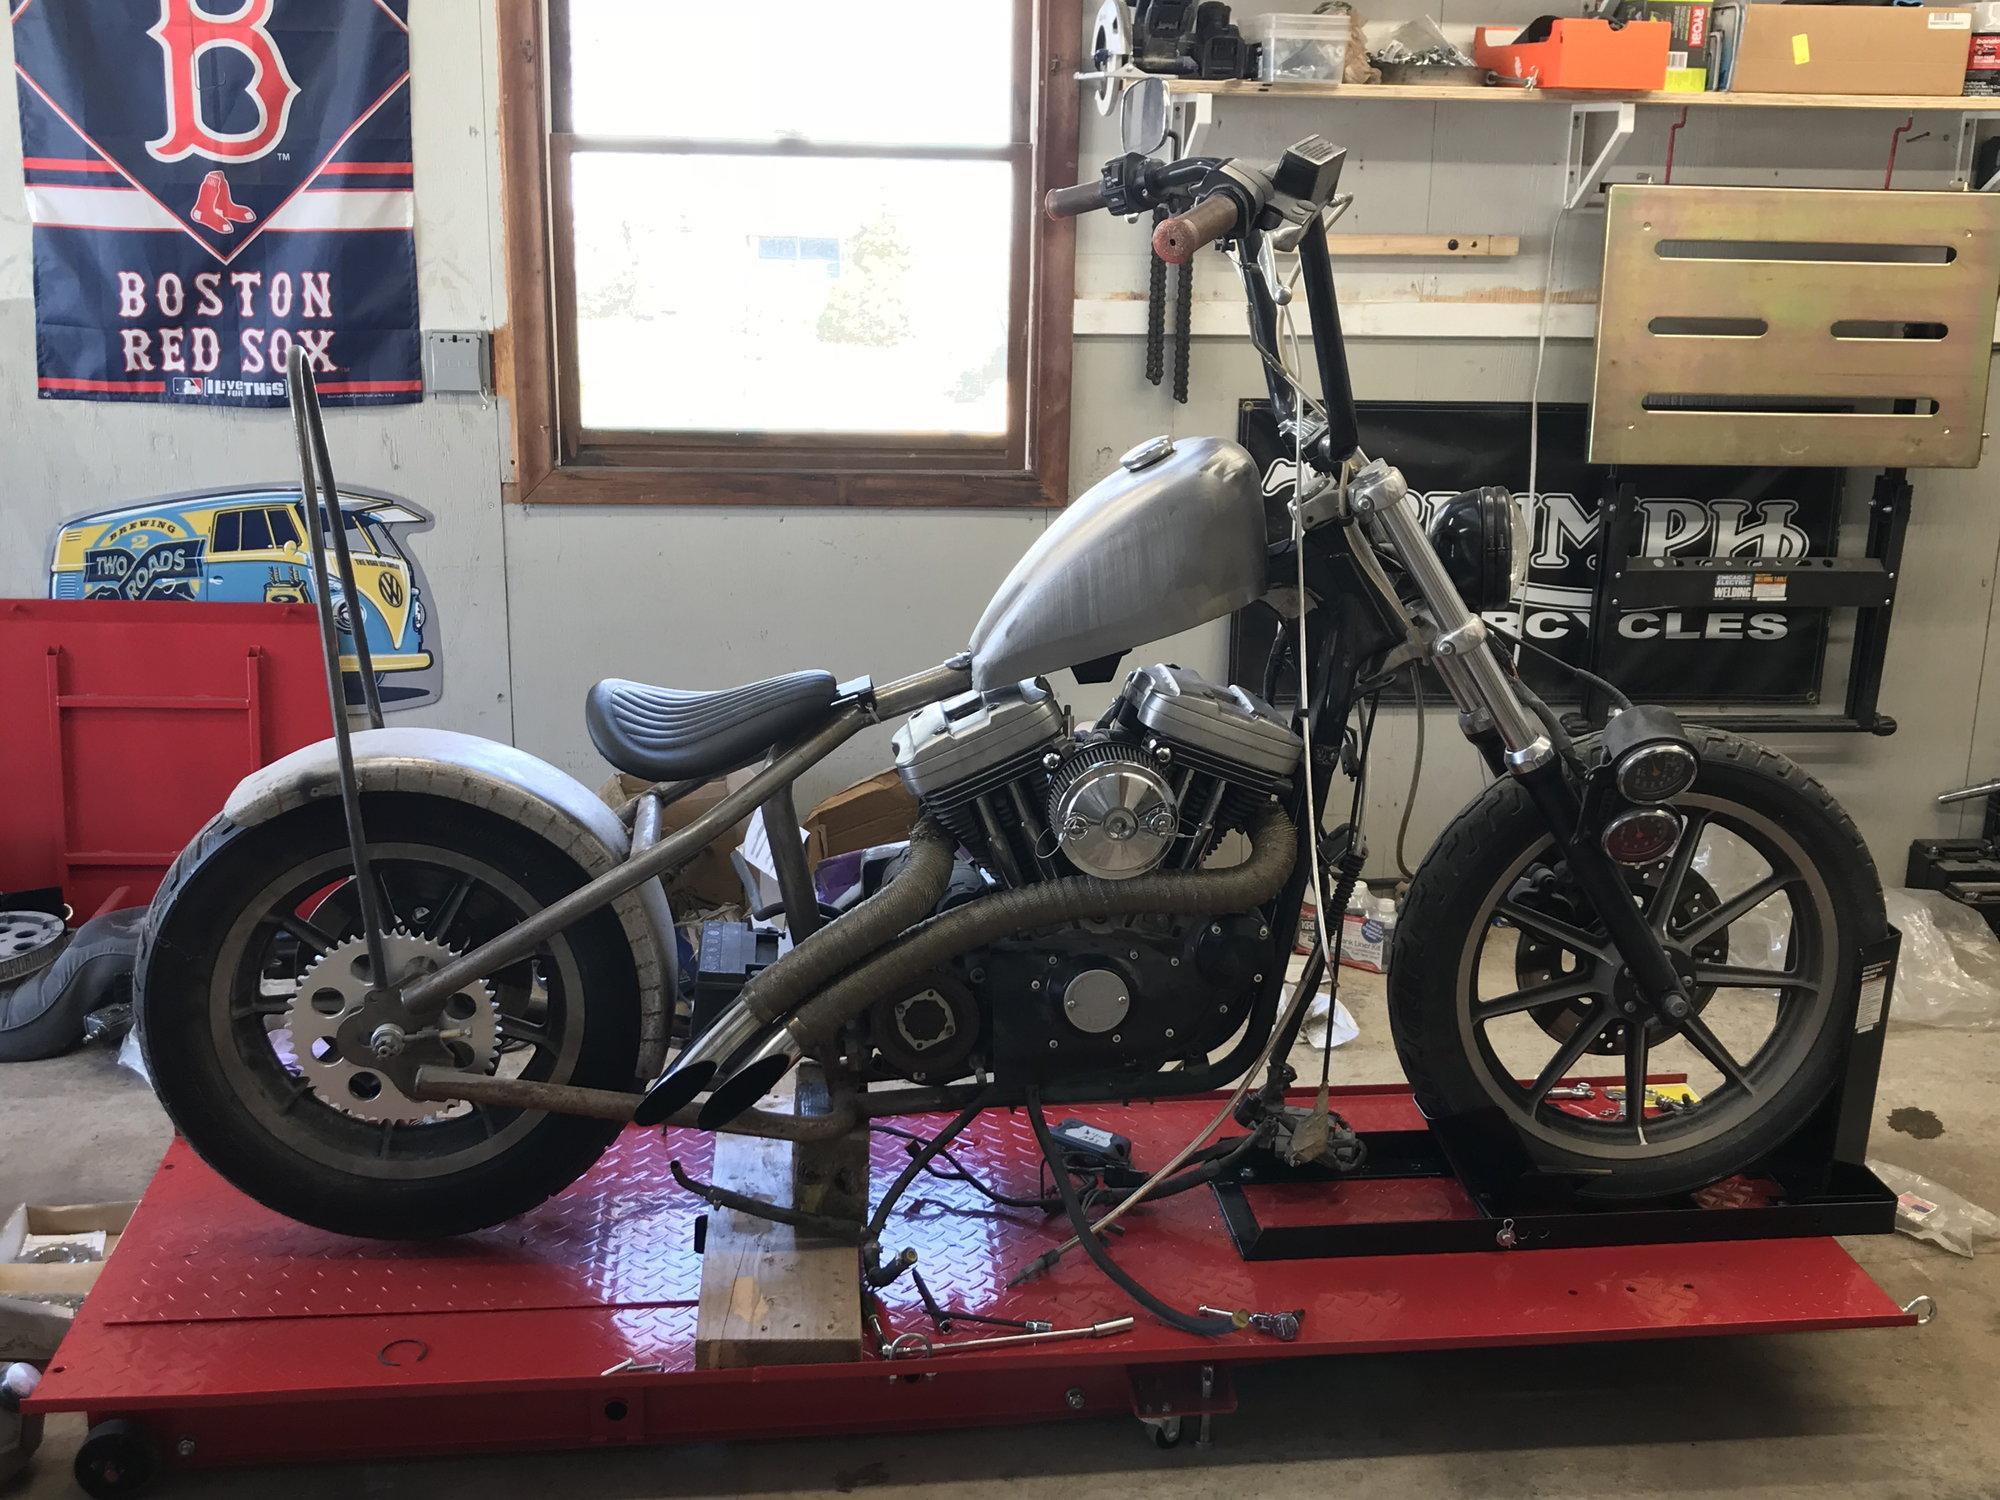 Electrical Diagram Needed, 94 Sportster 1200 - Harley ... on